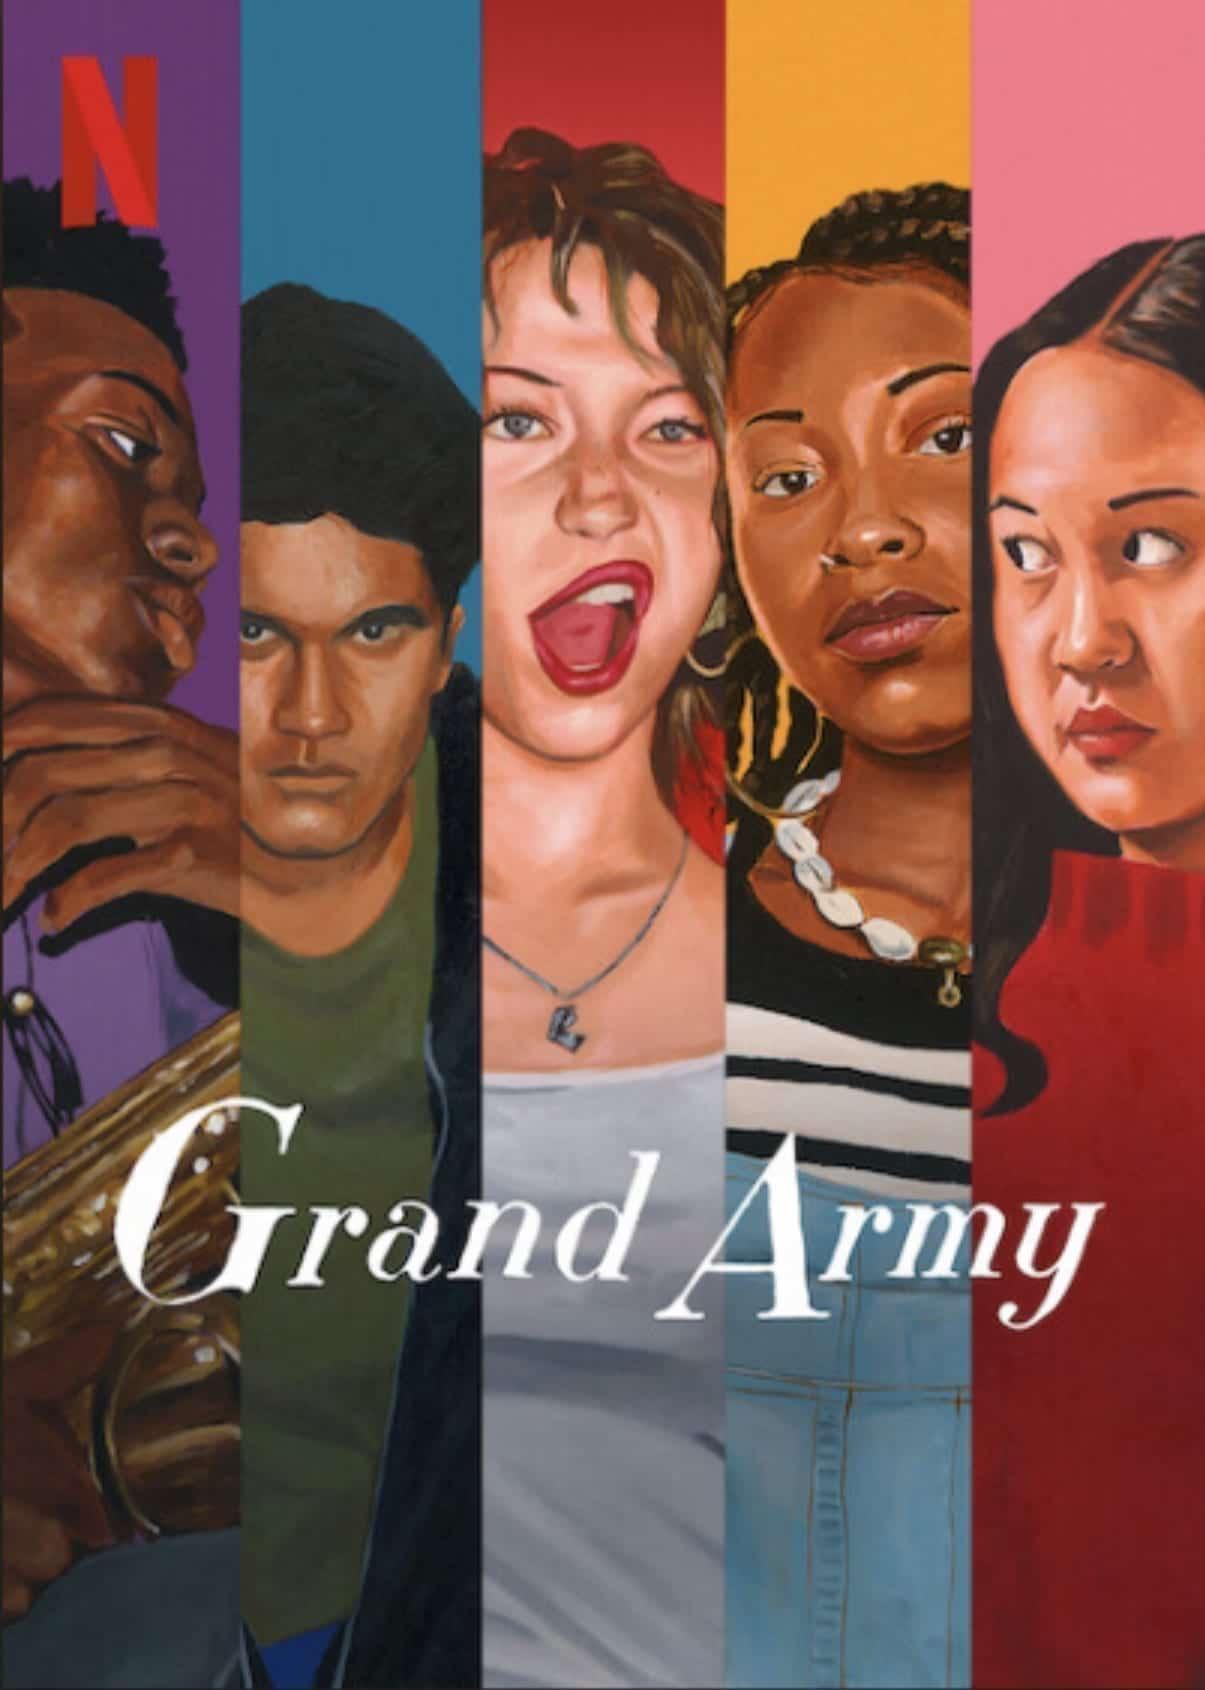 Grand Army (2020). Serie Netflix